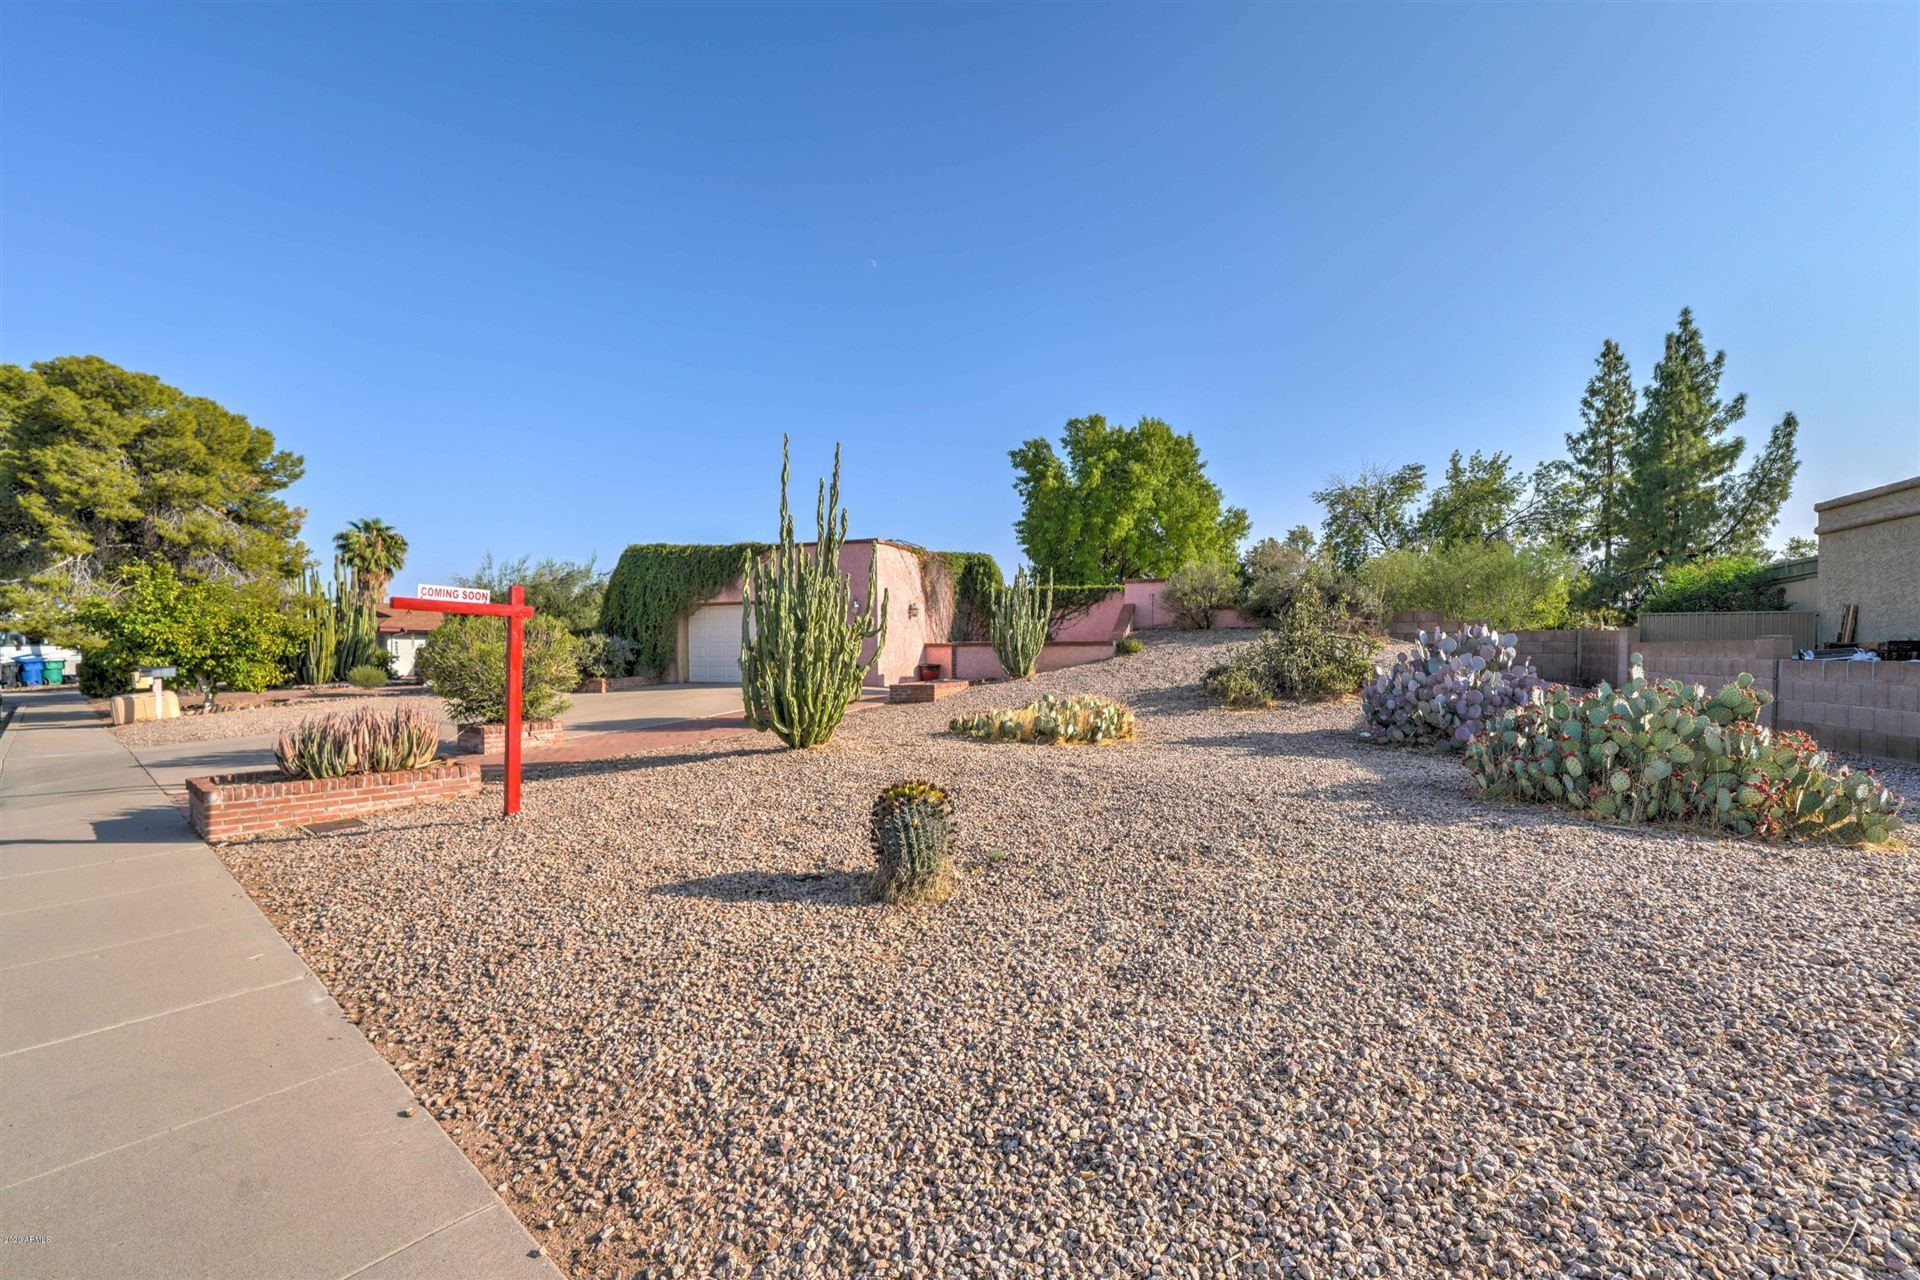 2025 E DOWNING Street, Mesa, AZ 85213 - MLS#: 6125459